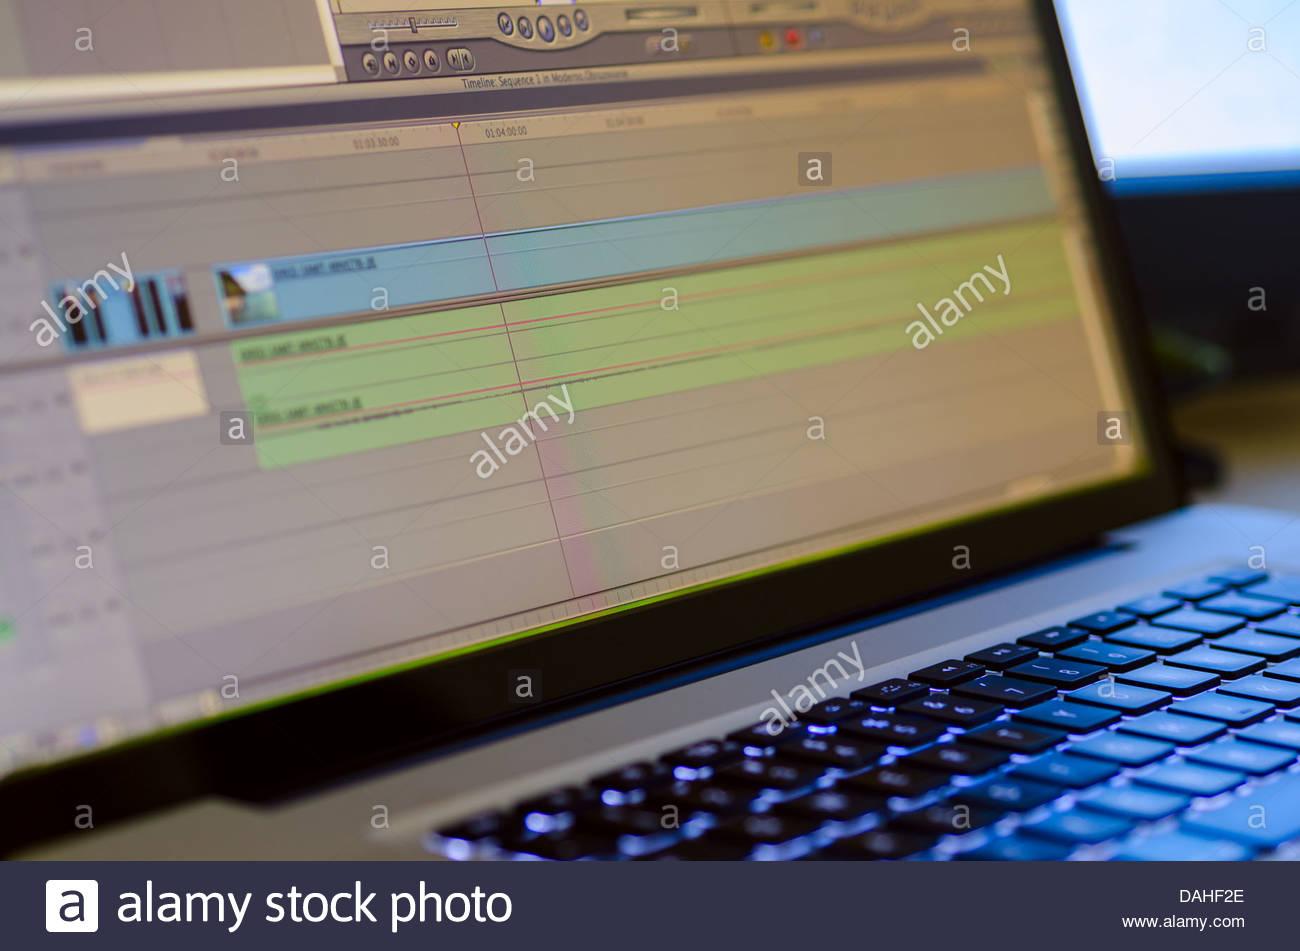 Professional video editing equipment - Stock Image